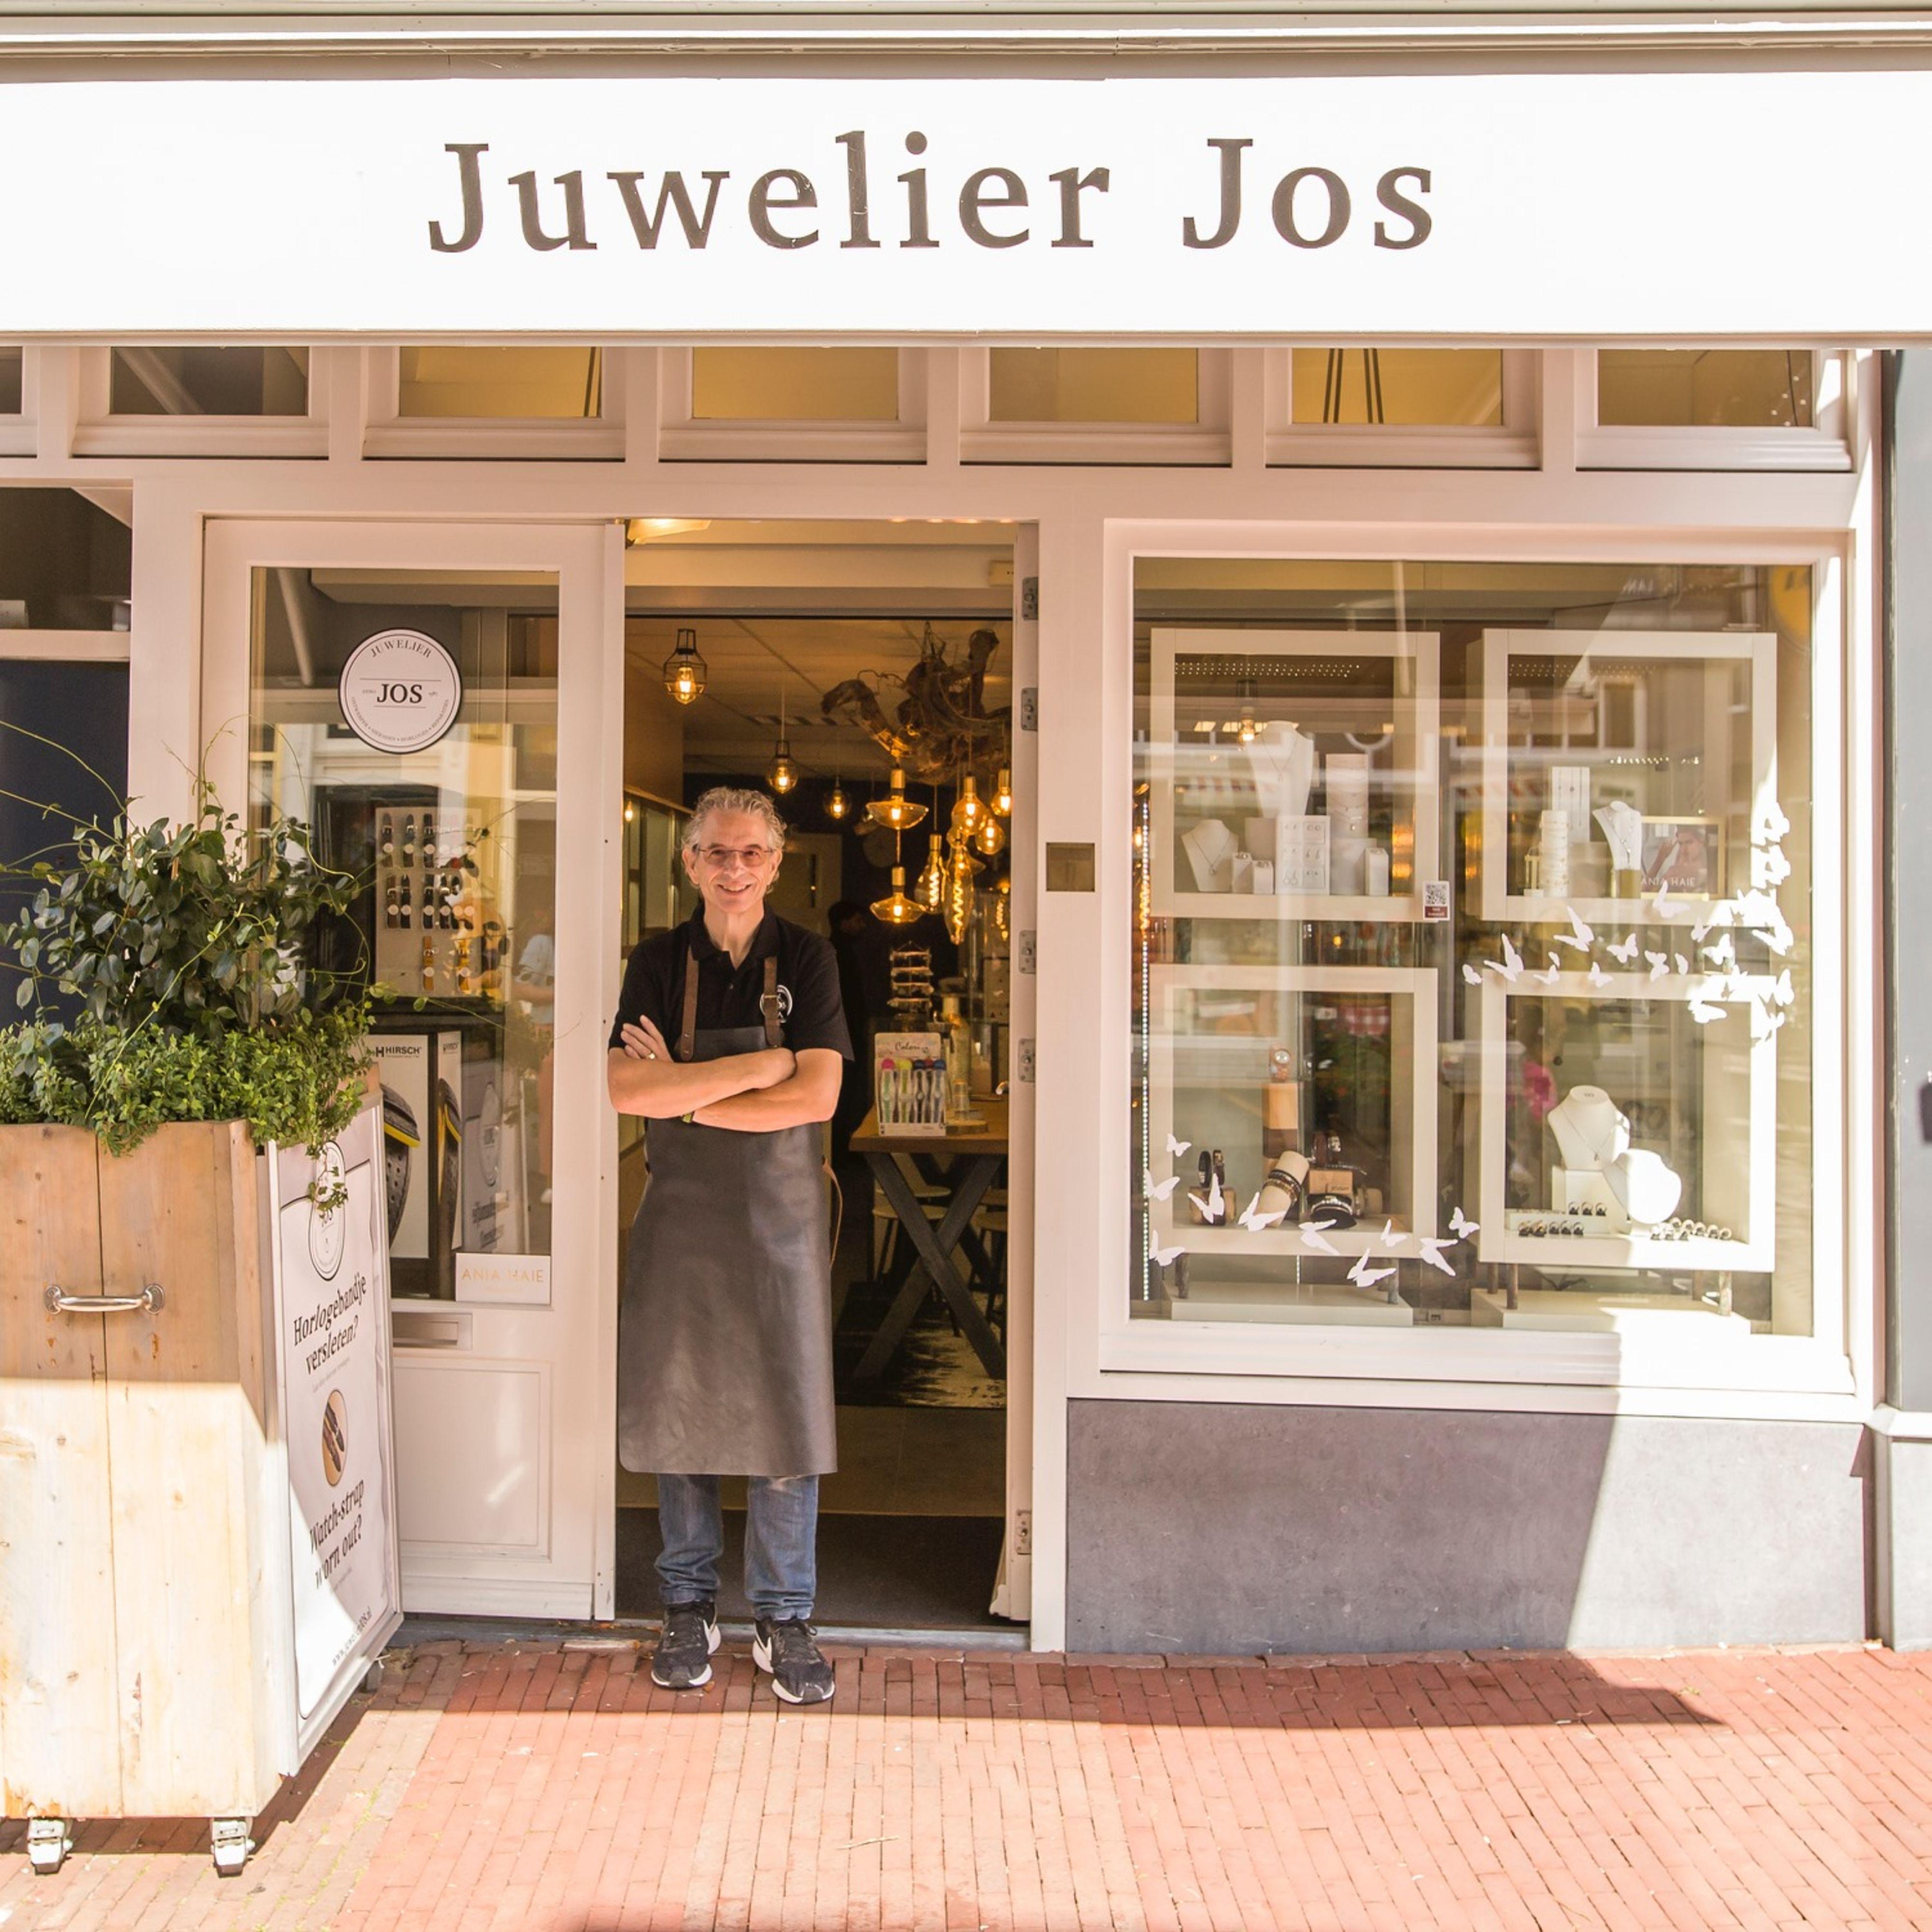 Juwelier Jos